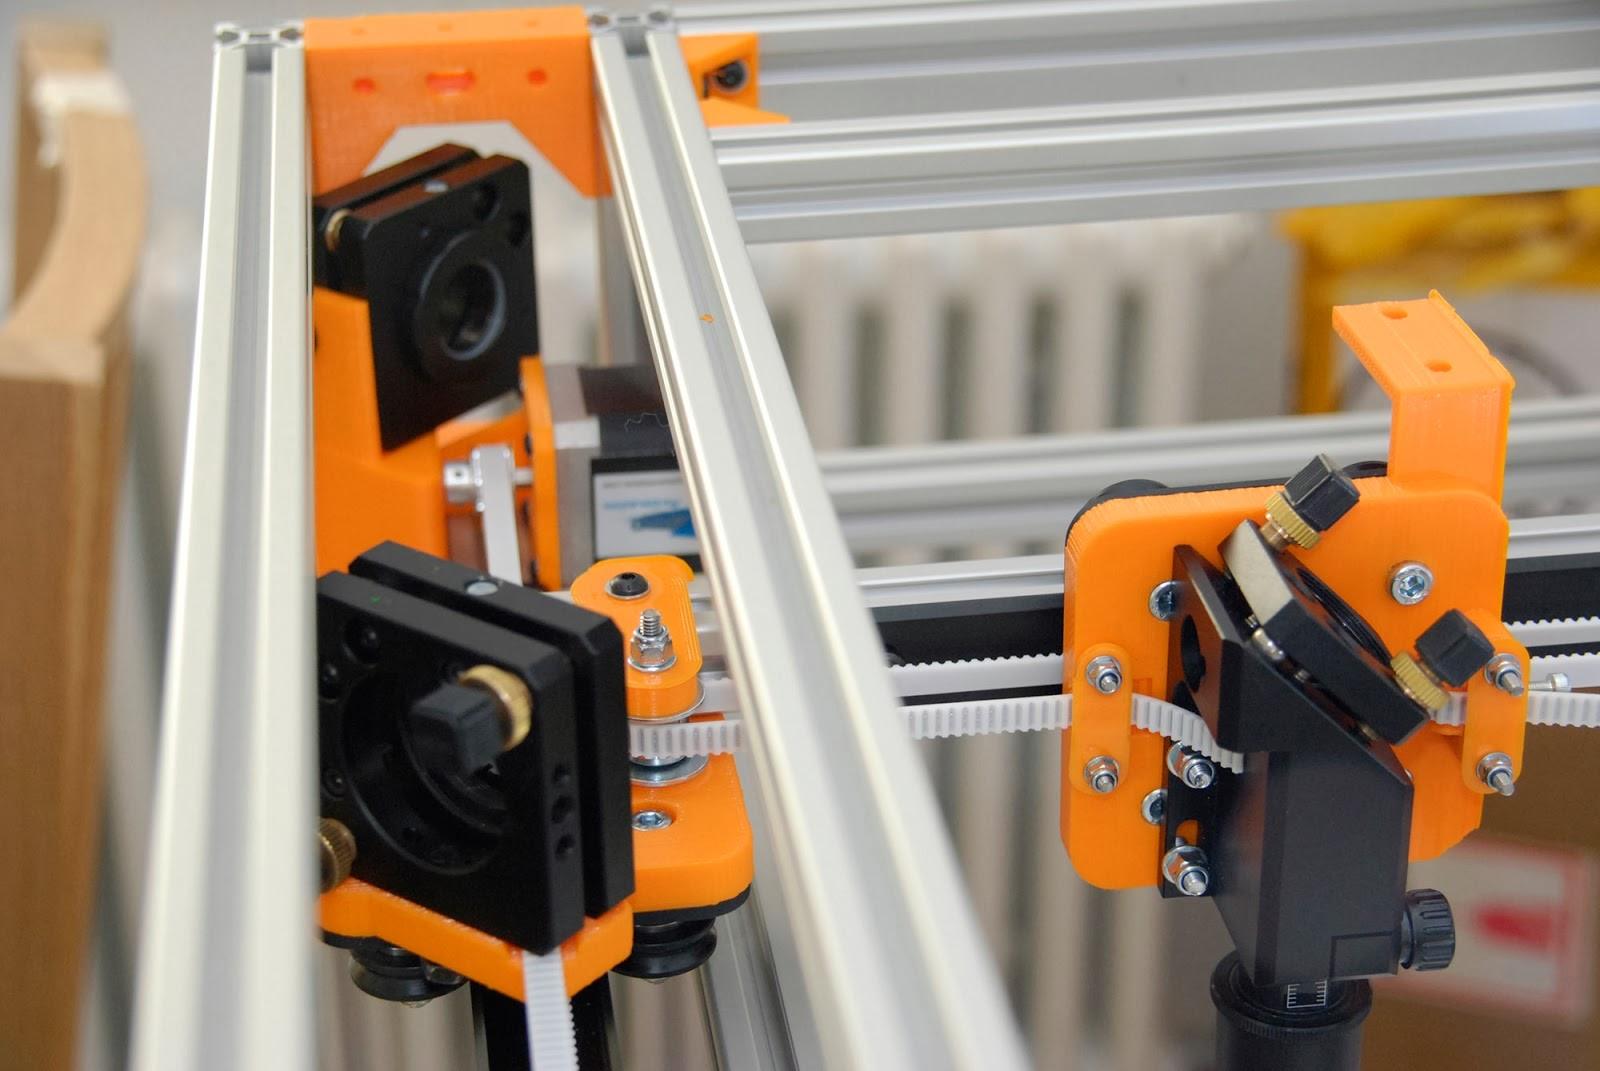 DIY 3D Printing: axCut DIY laser cutter